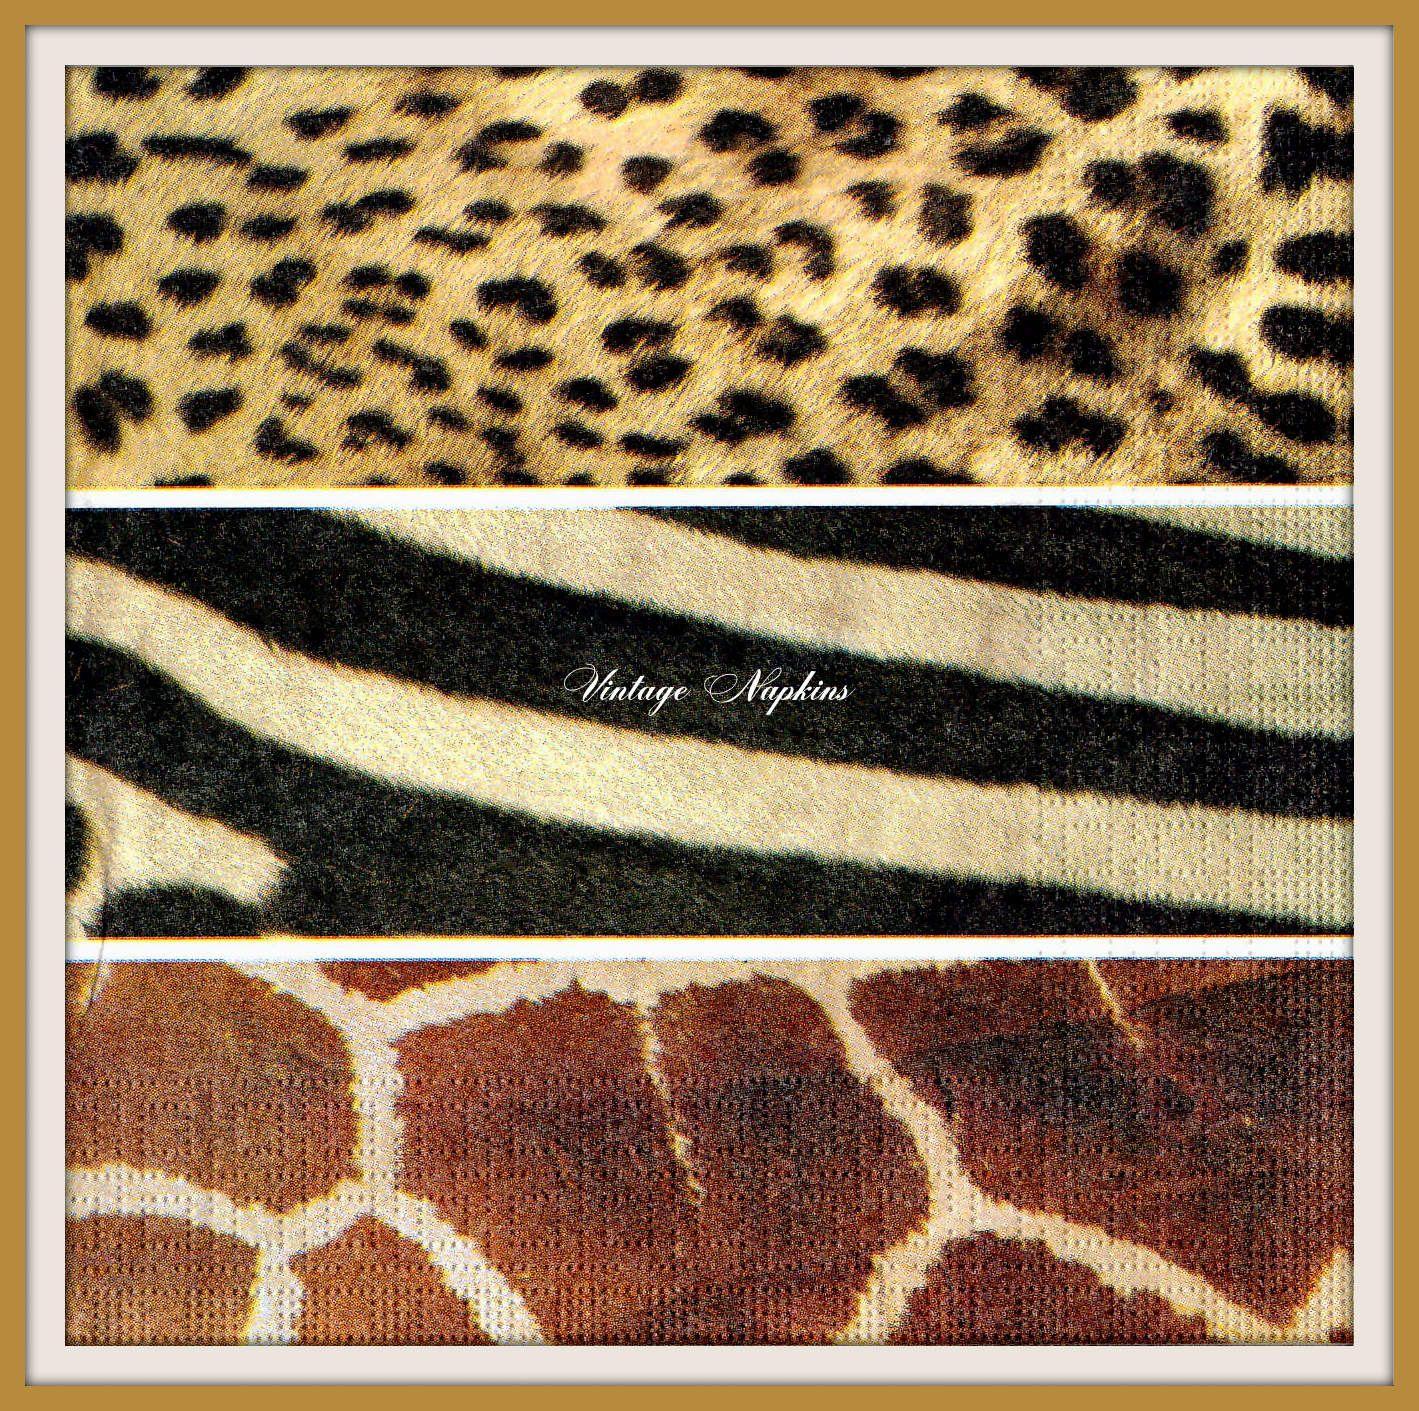 PAPER napkins for DECOUPAGE - Animal Patterns Zebra Leopard Giraffe #370 by VintageNapkins on Etsy